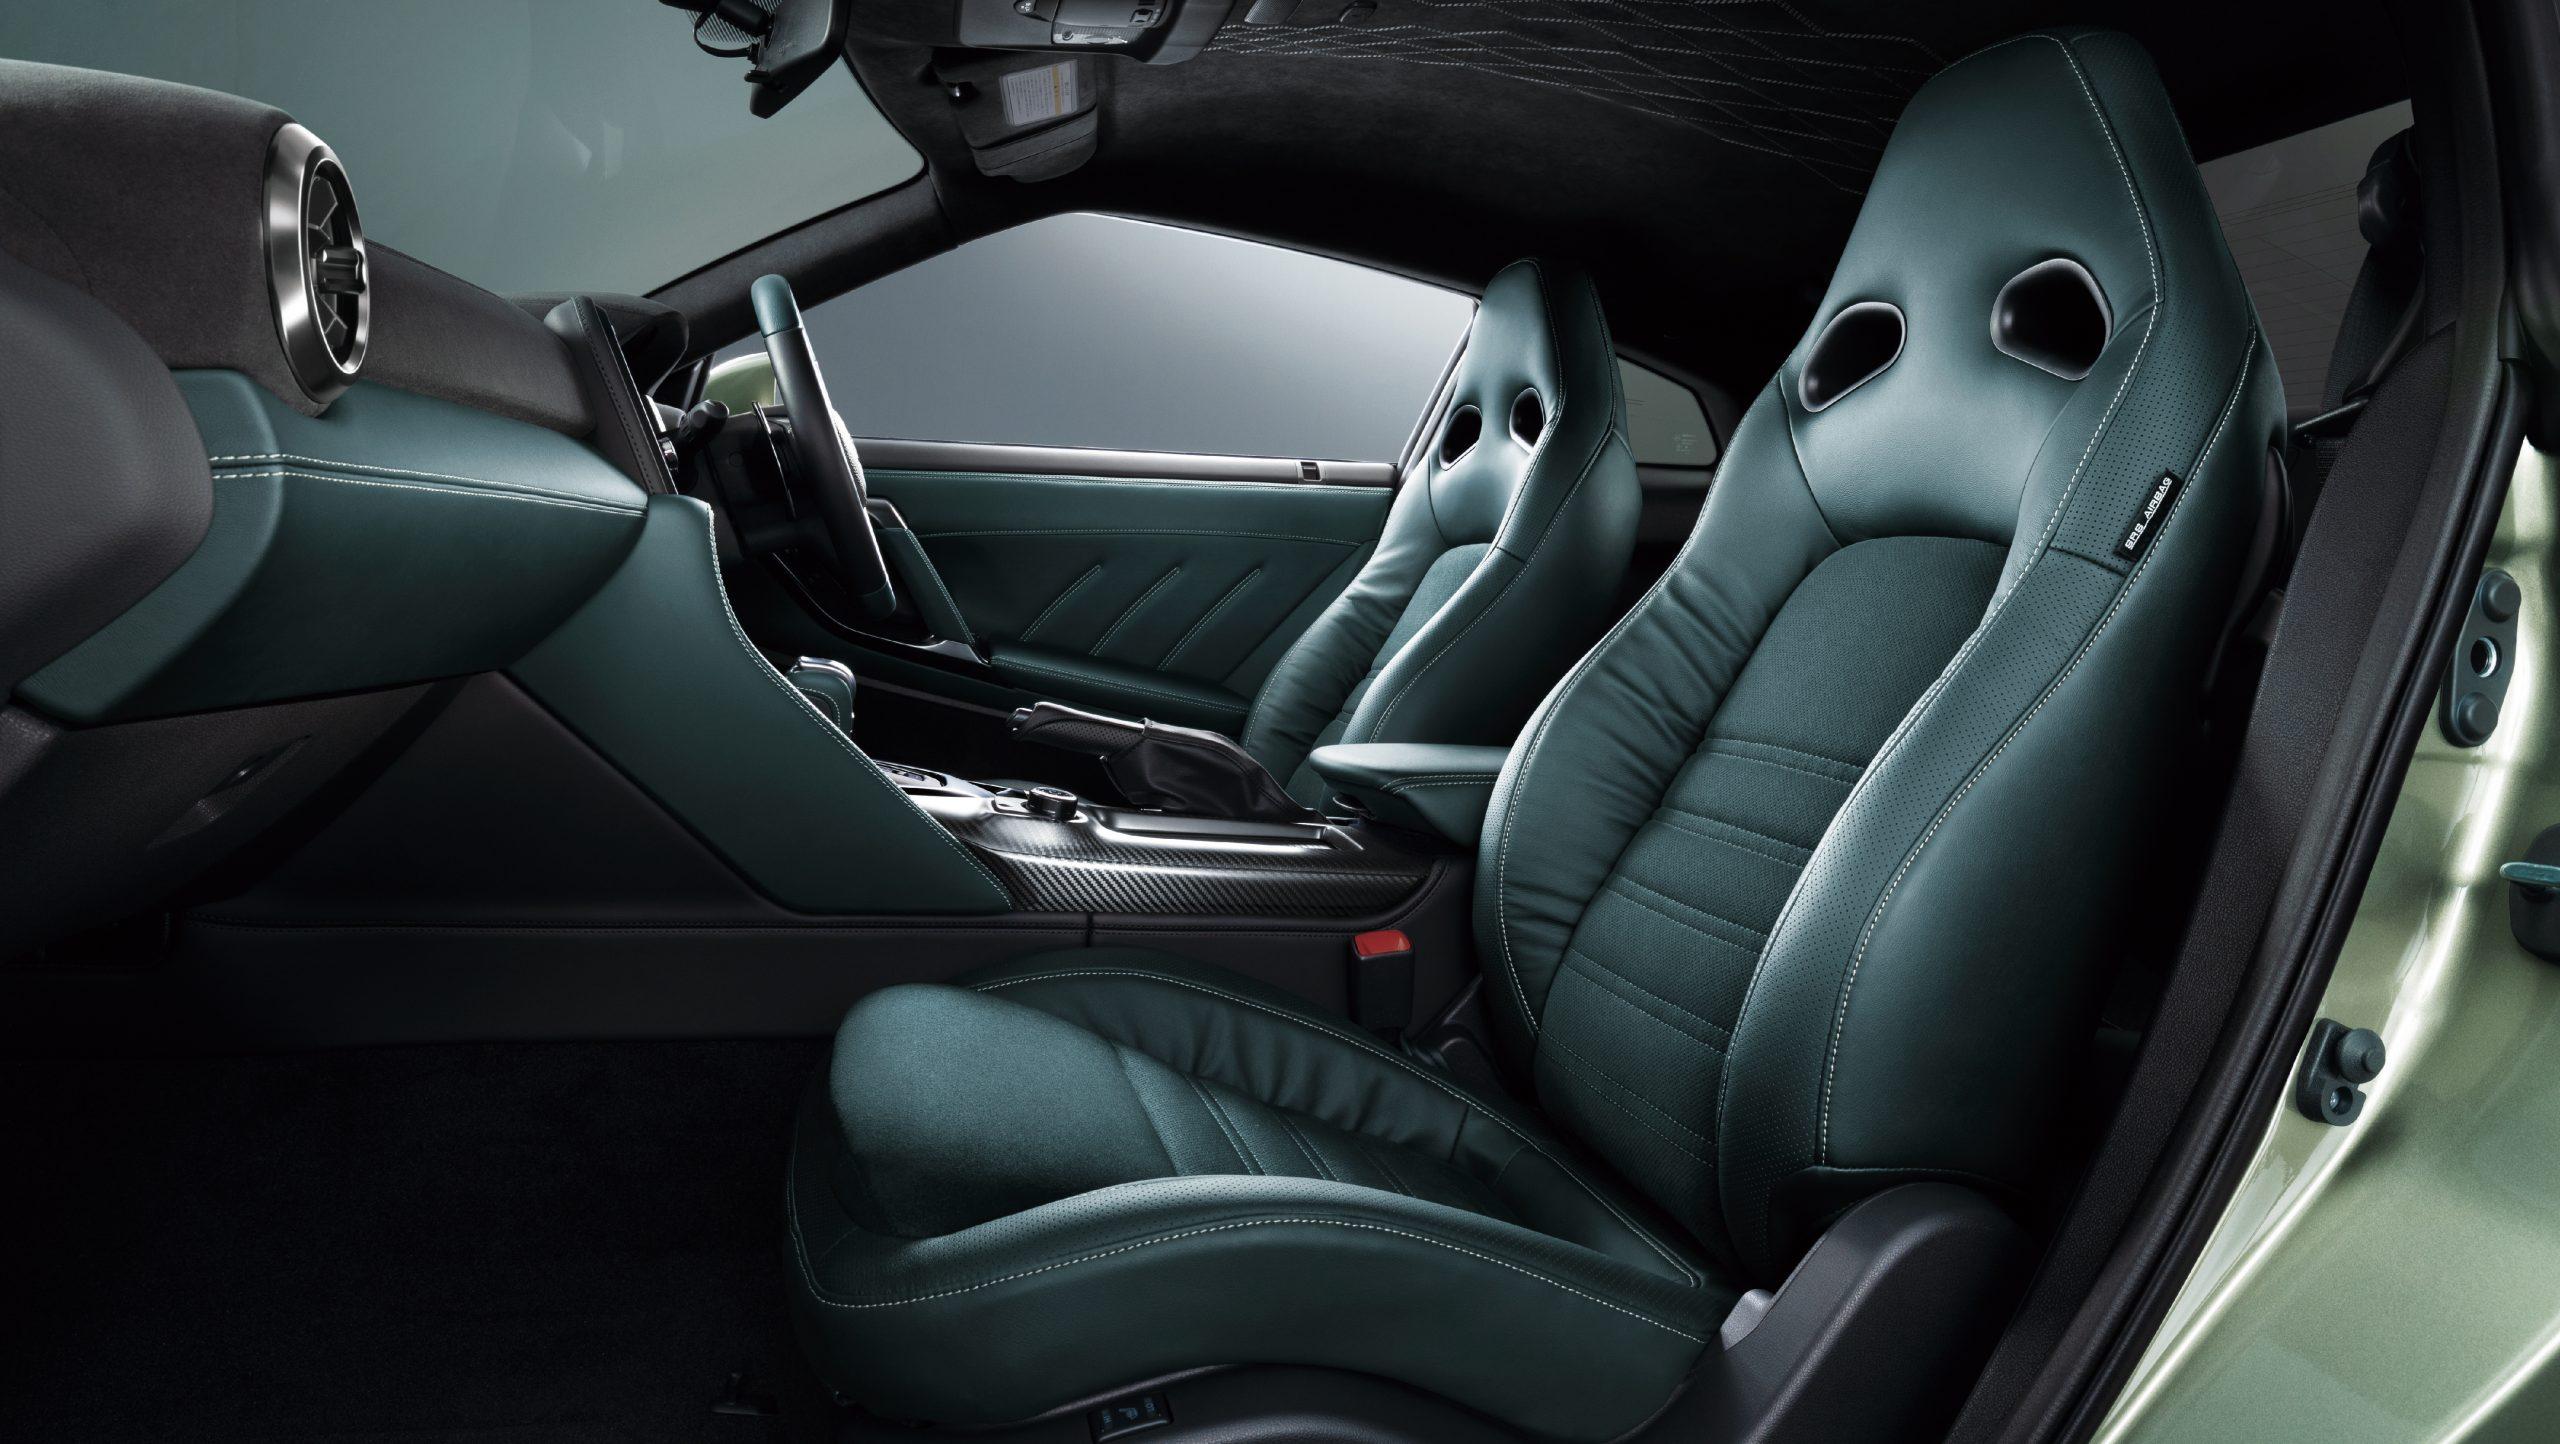 2022 Nissan GT-R Premium T-Spec interior green